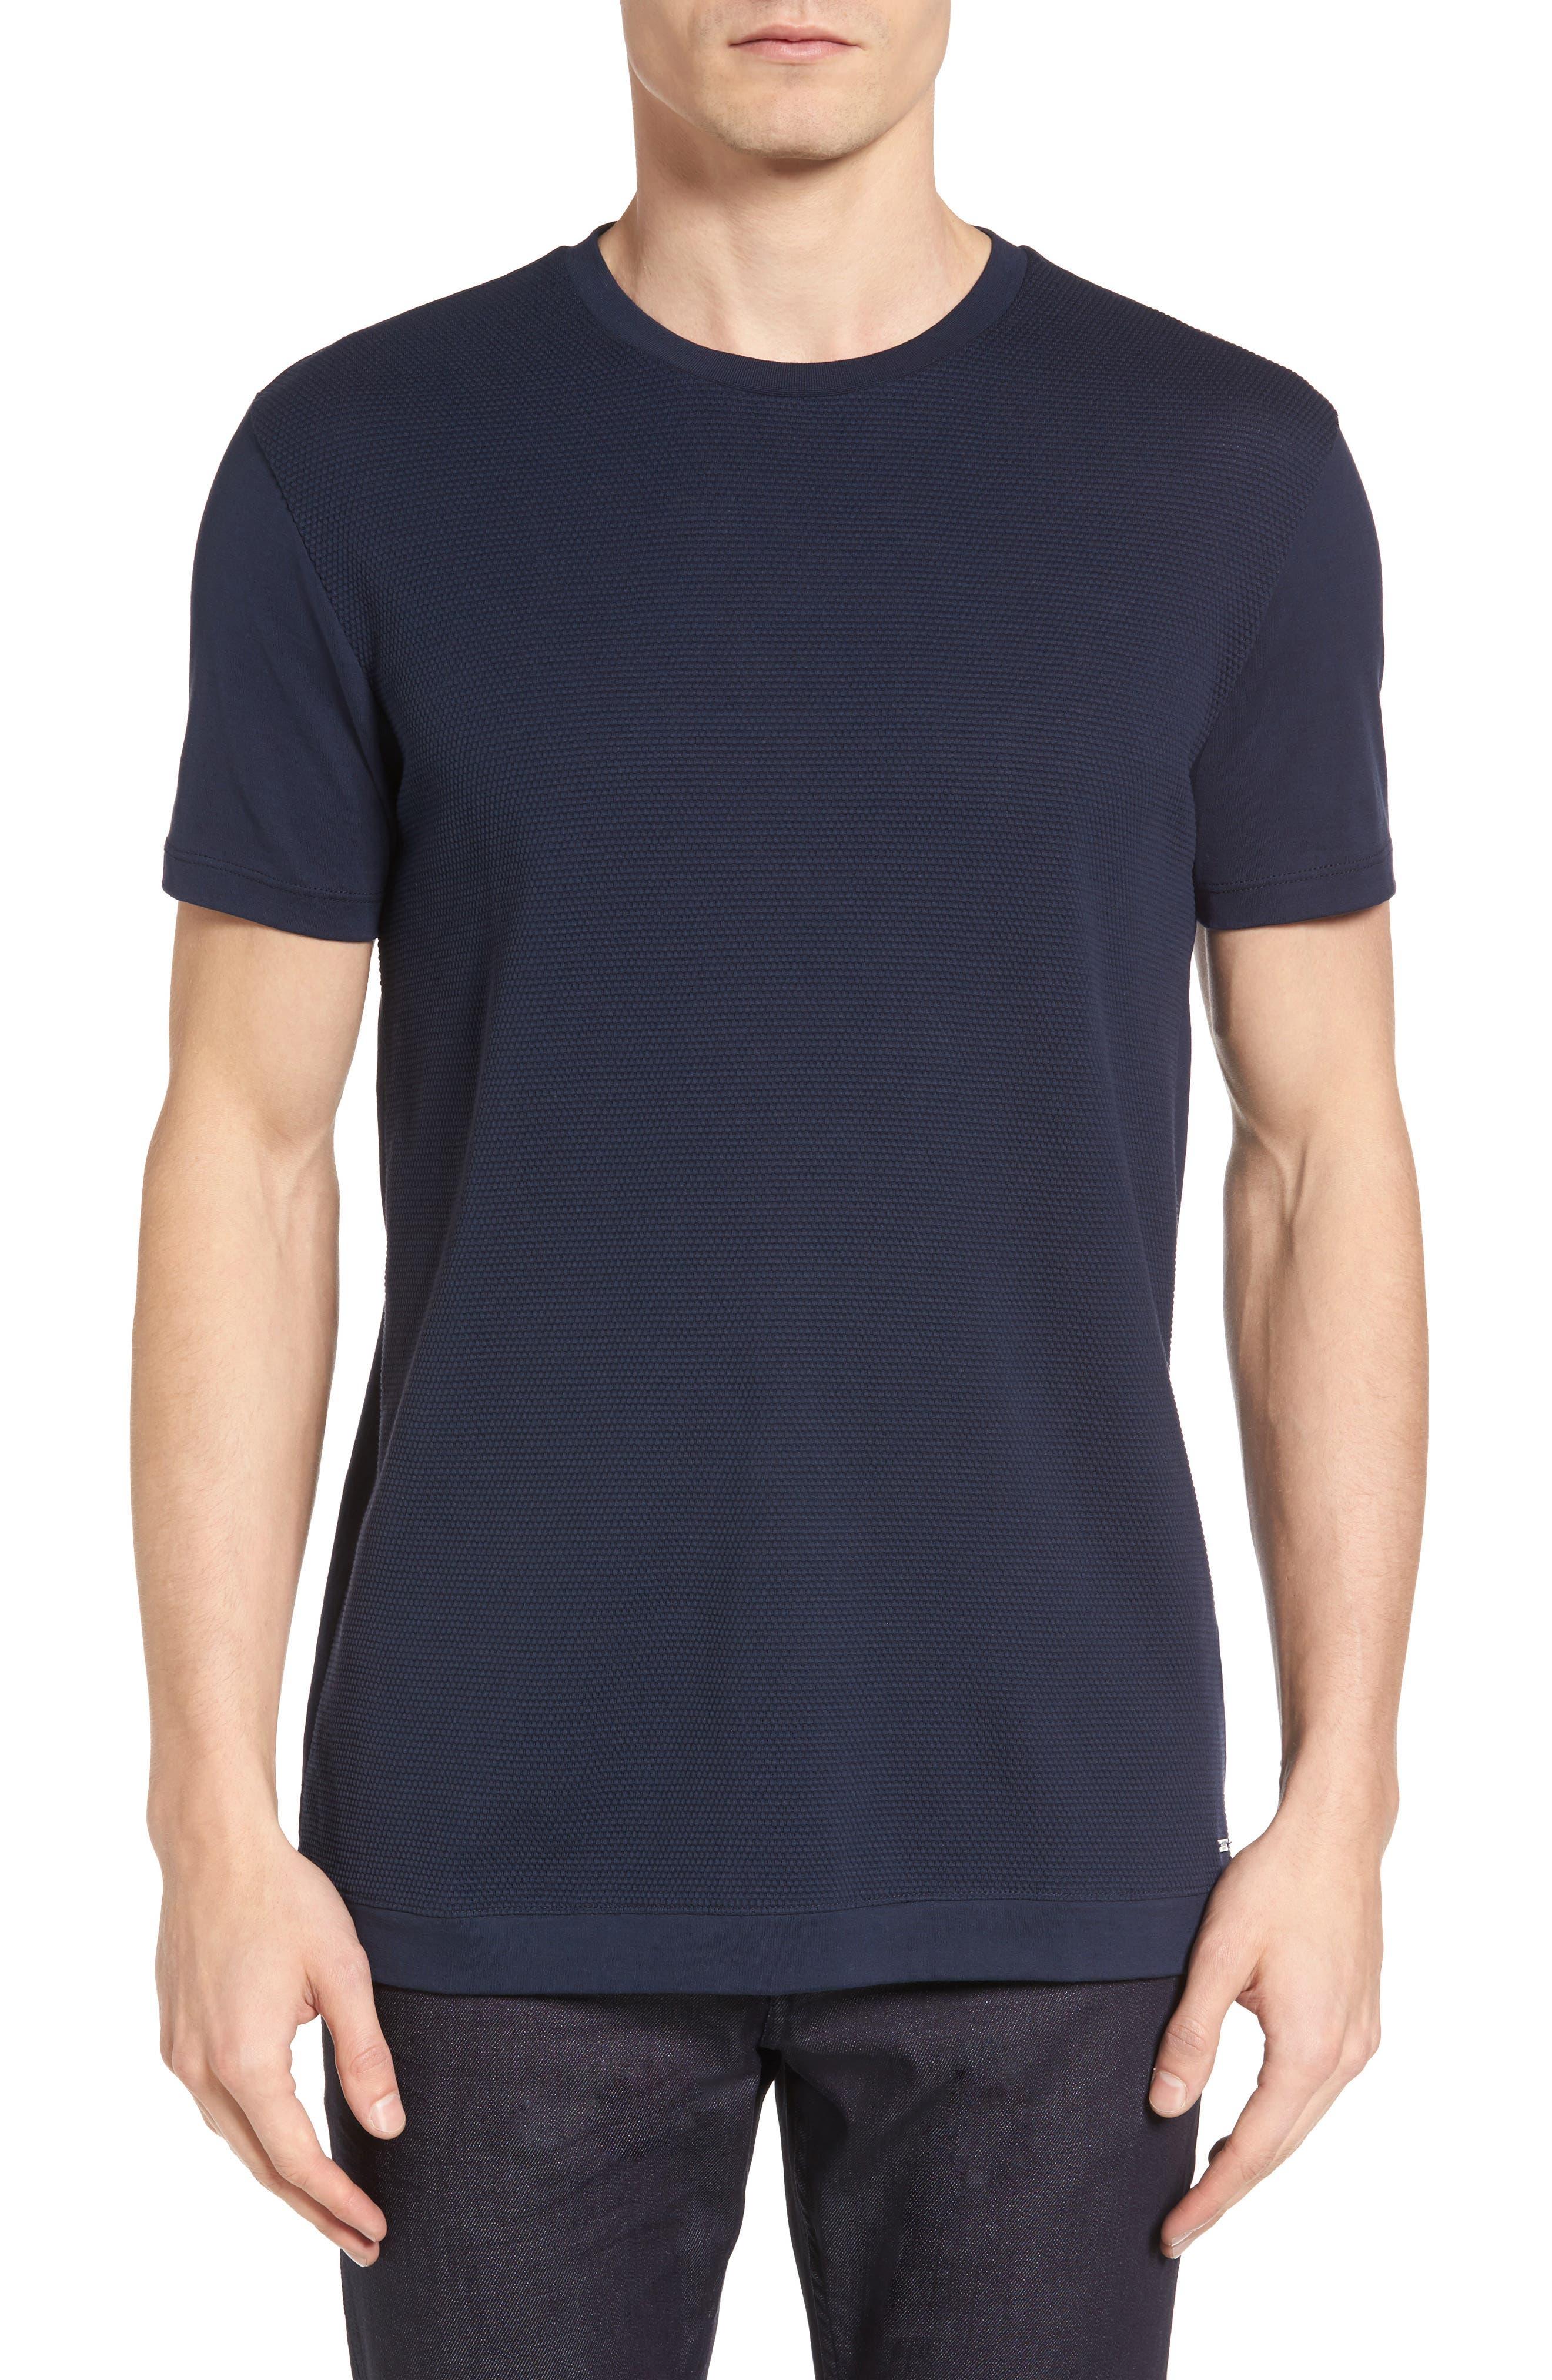 Main Image - BOSS Tessler Micropattern T-Shirt